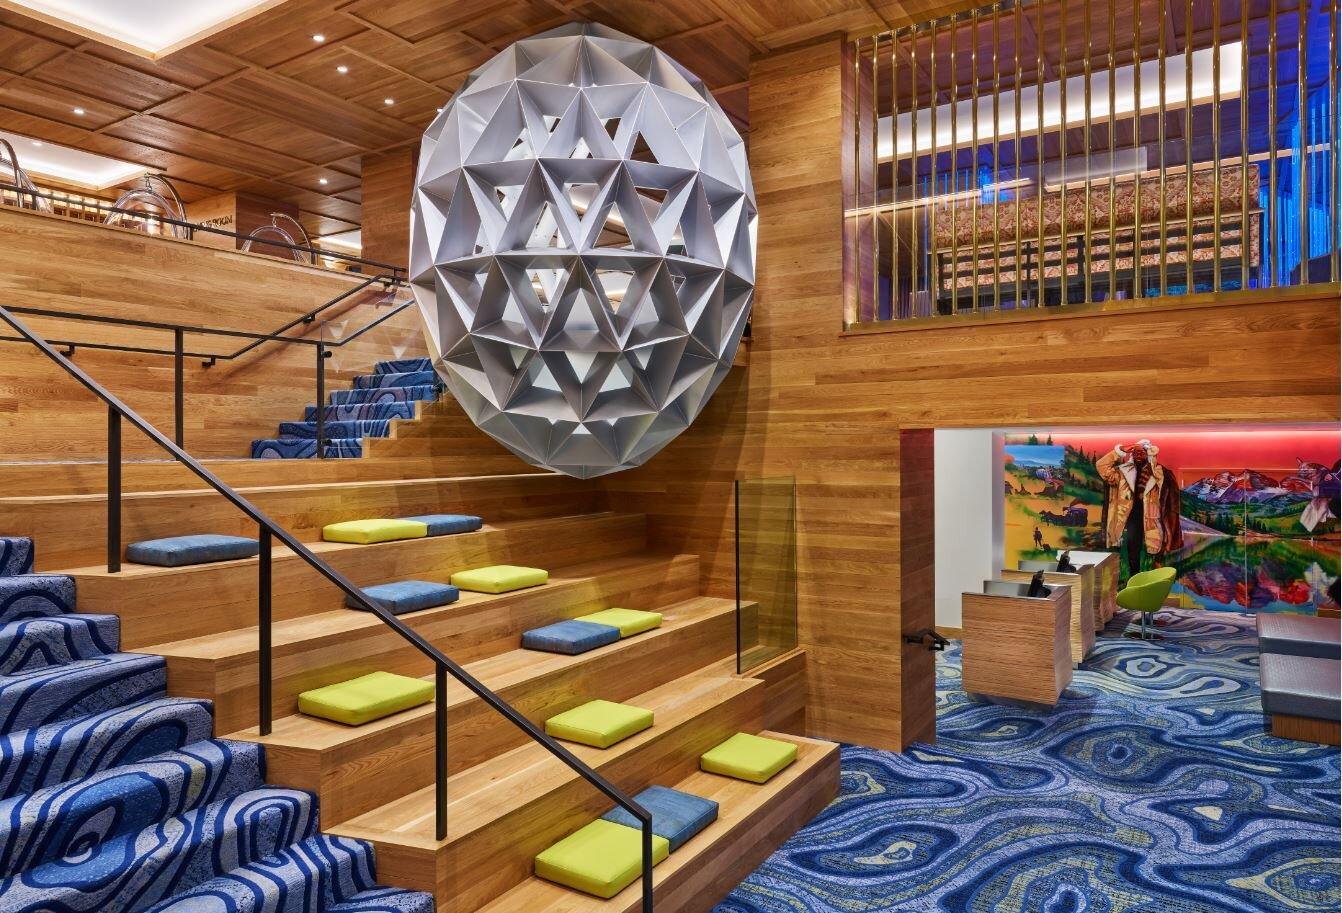 W Hotel Aspen Lobby, W HOTELS